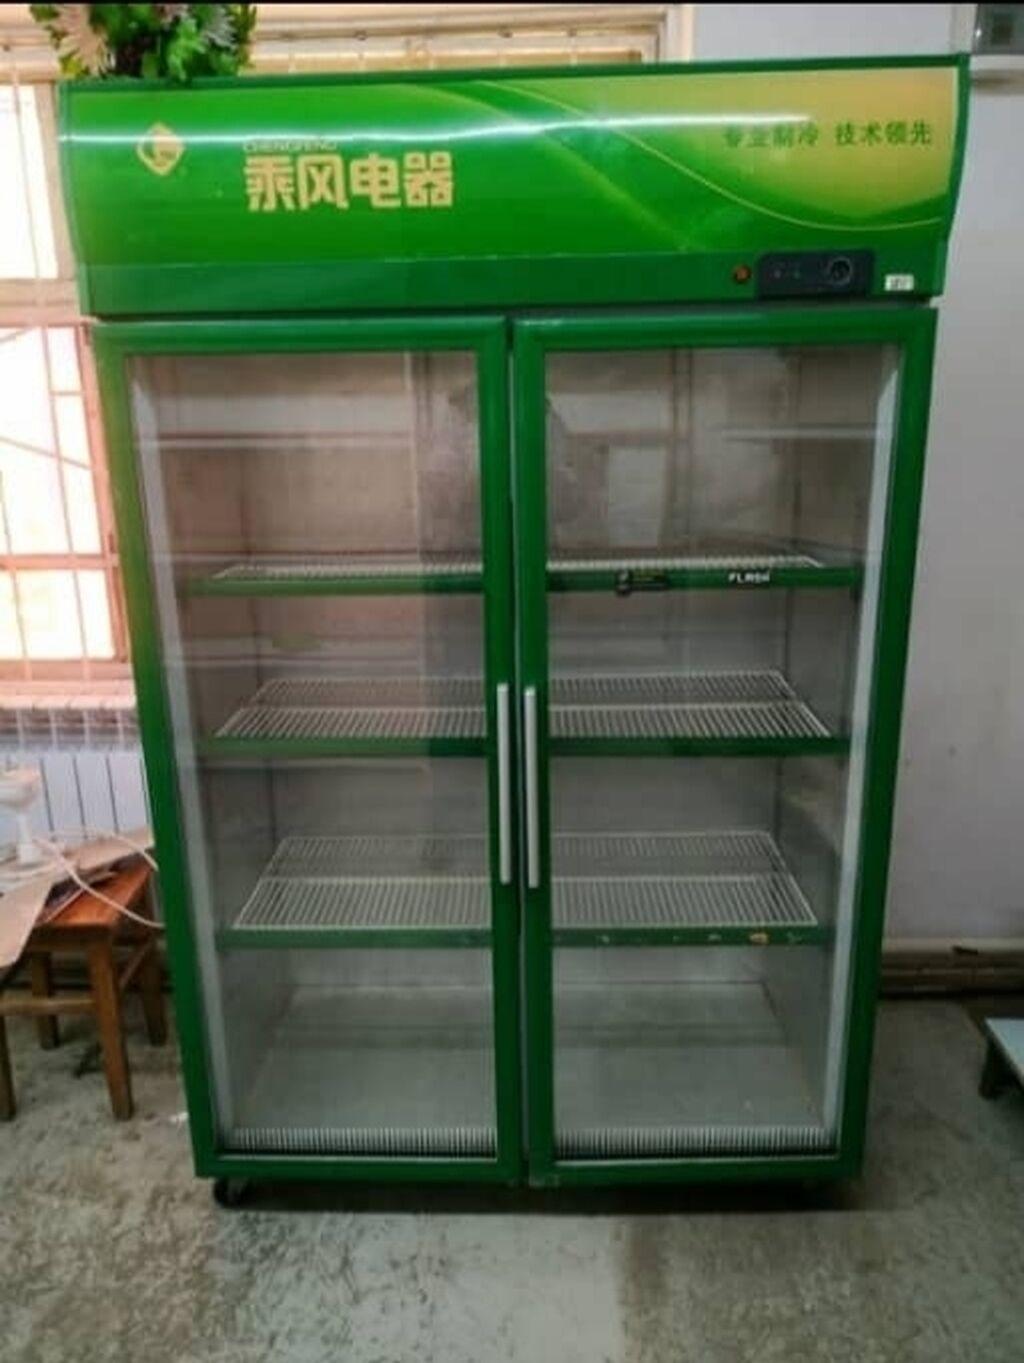 Б/у Холодильник-витрина | Зеленый холодильник | Объявление создано 10 Июнь 2021 14:21:14: Б/у Холодильник-витрина | Зеленый холодильник